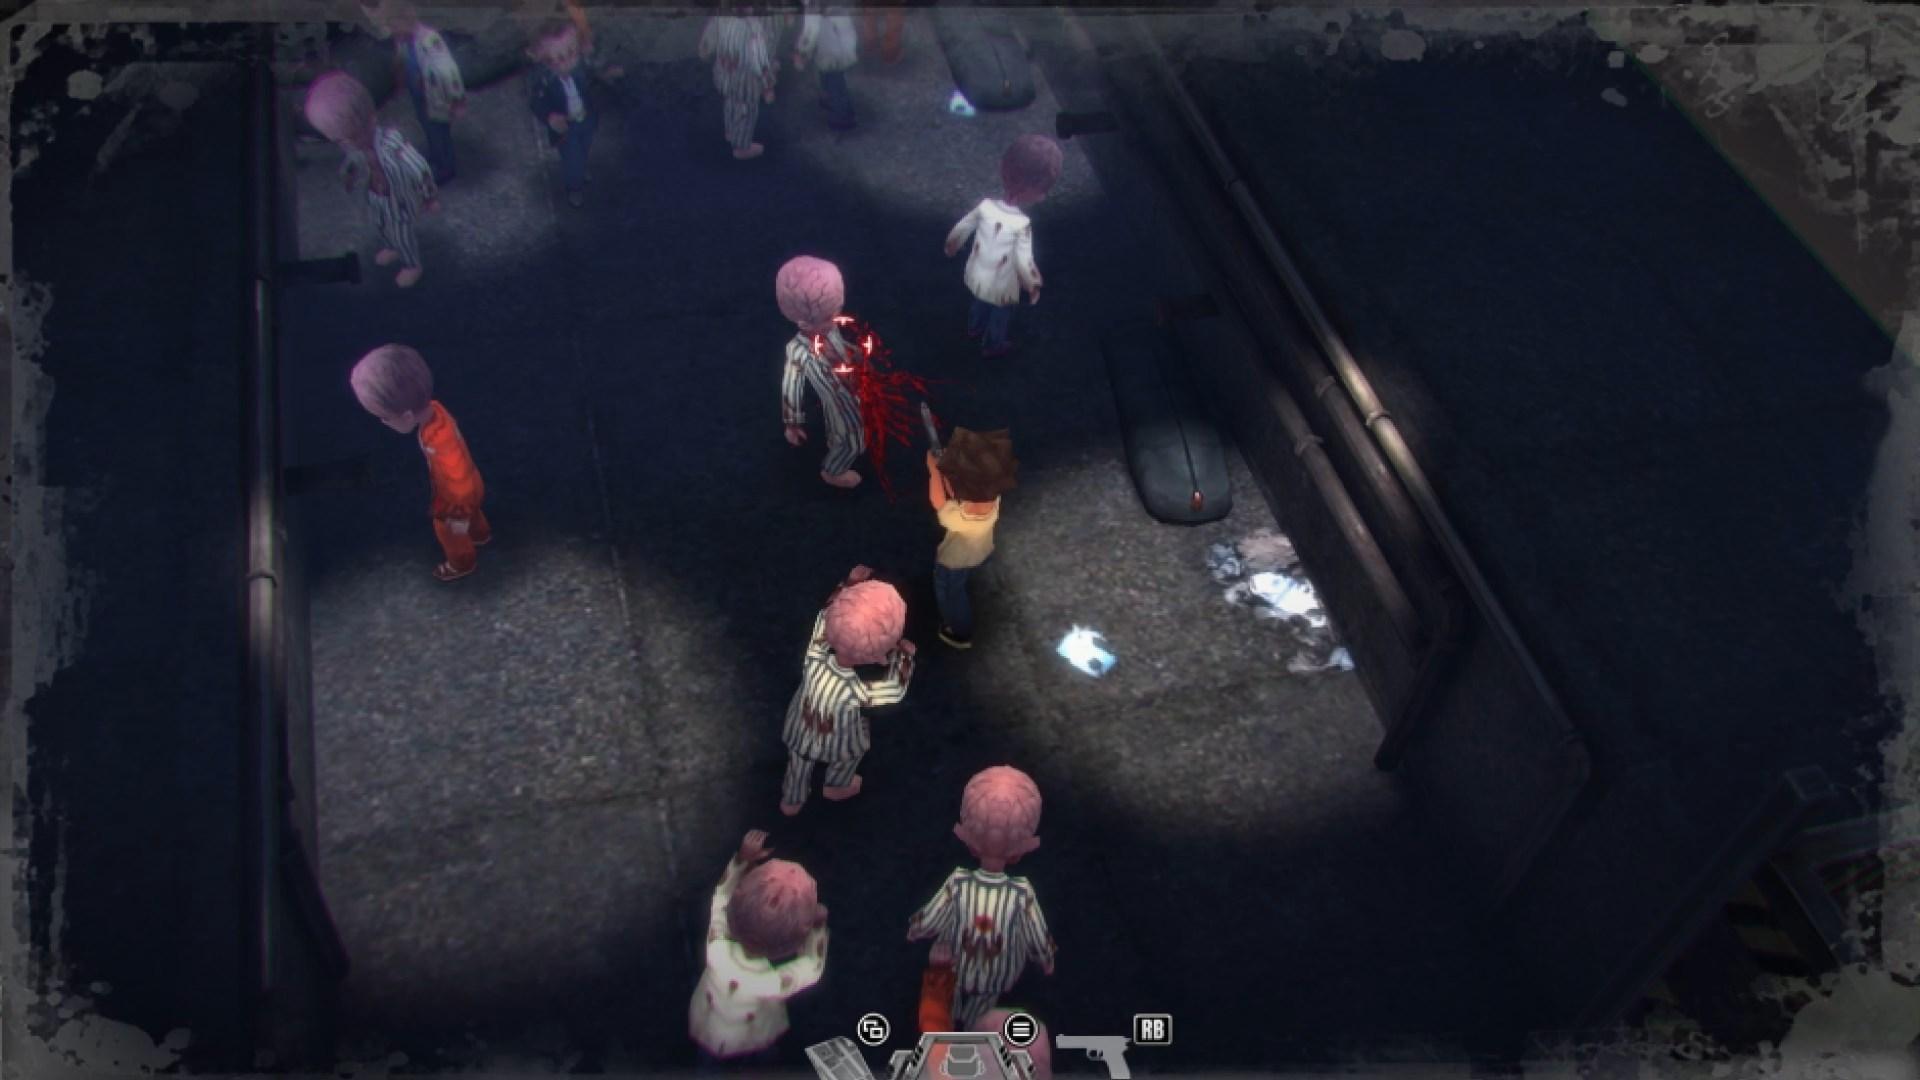 Heaven Dust - March 12 - Xbox One X Enhanced